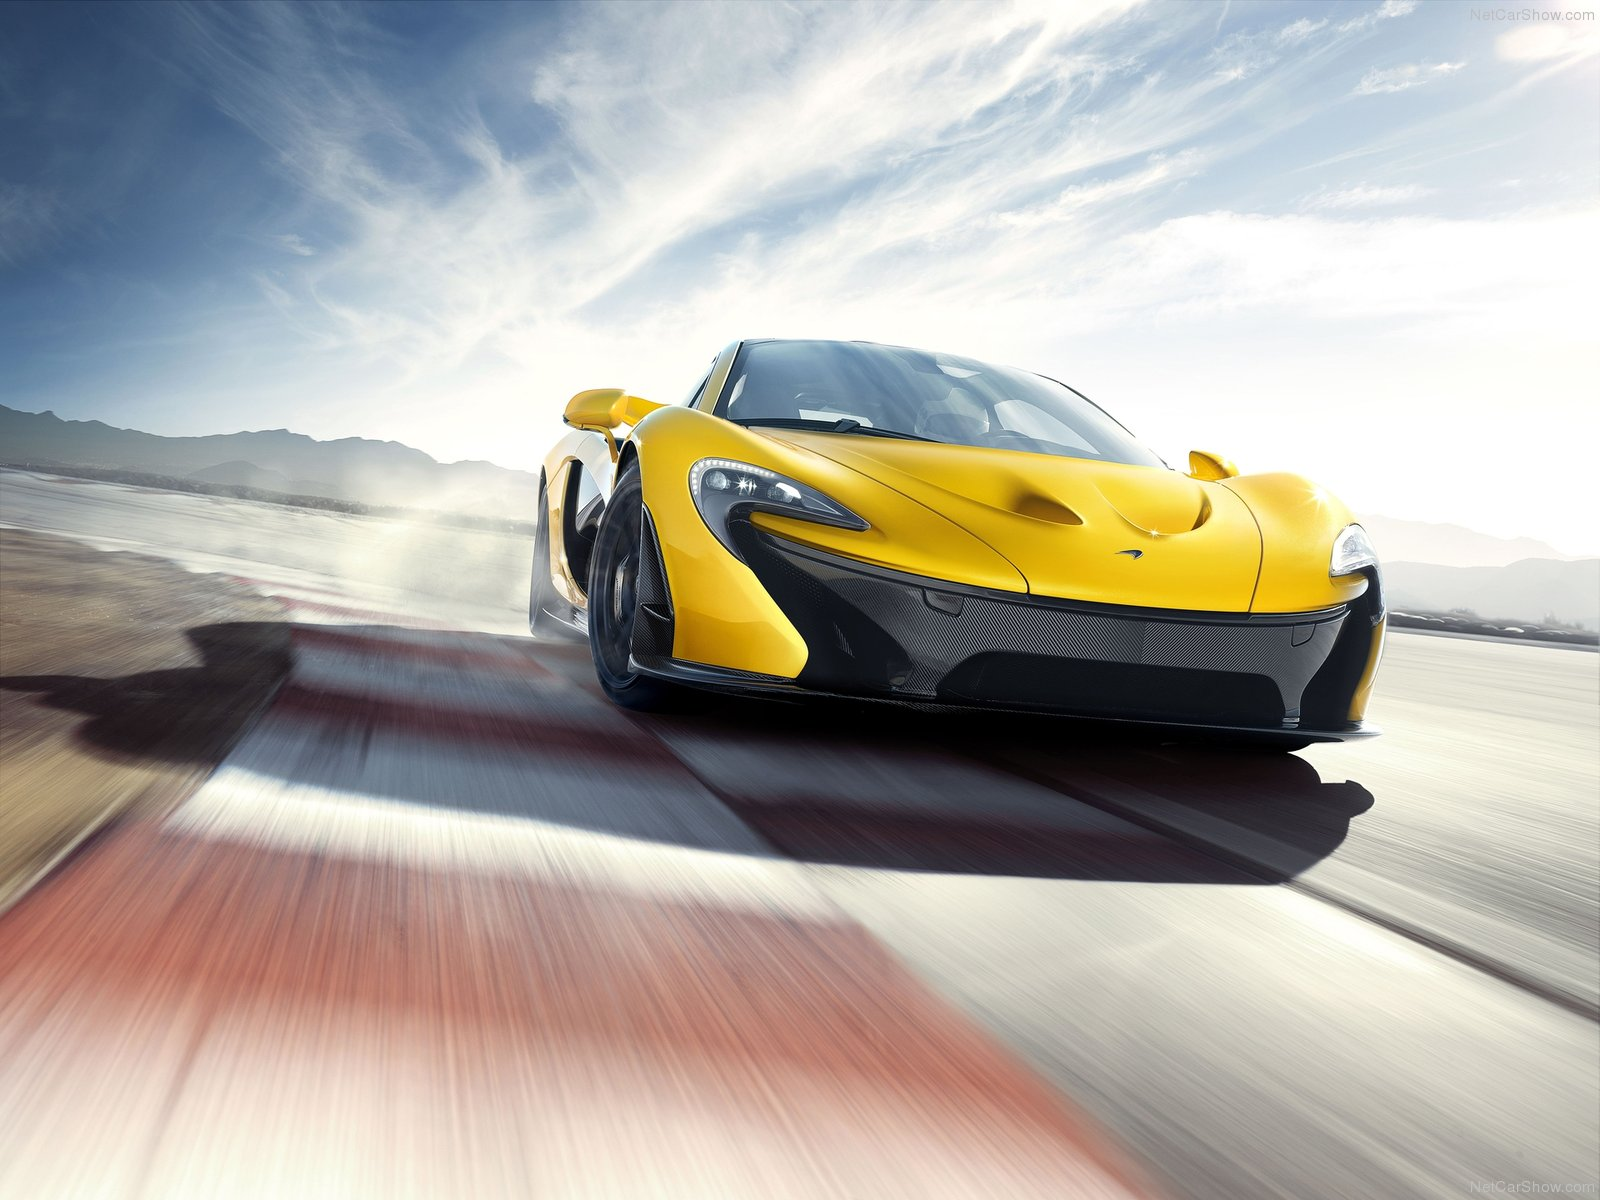 2014 McLaren P1 on track